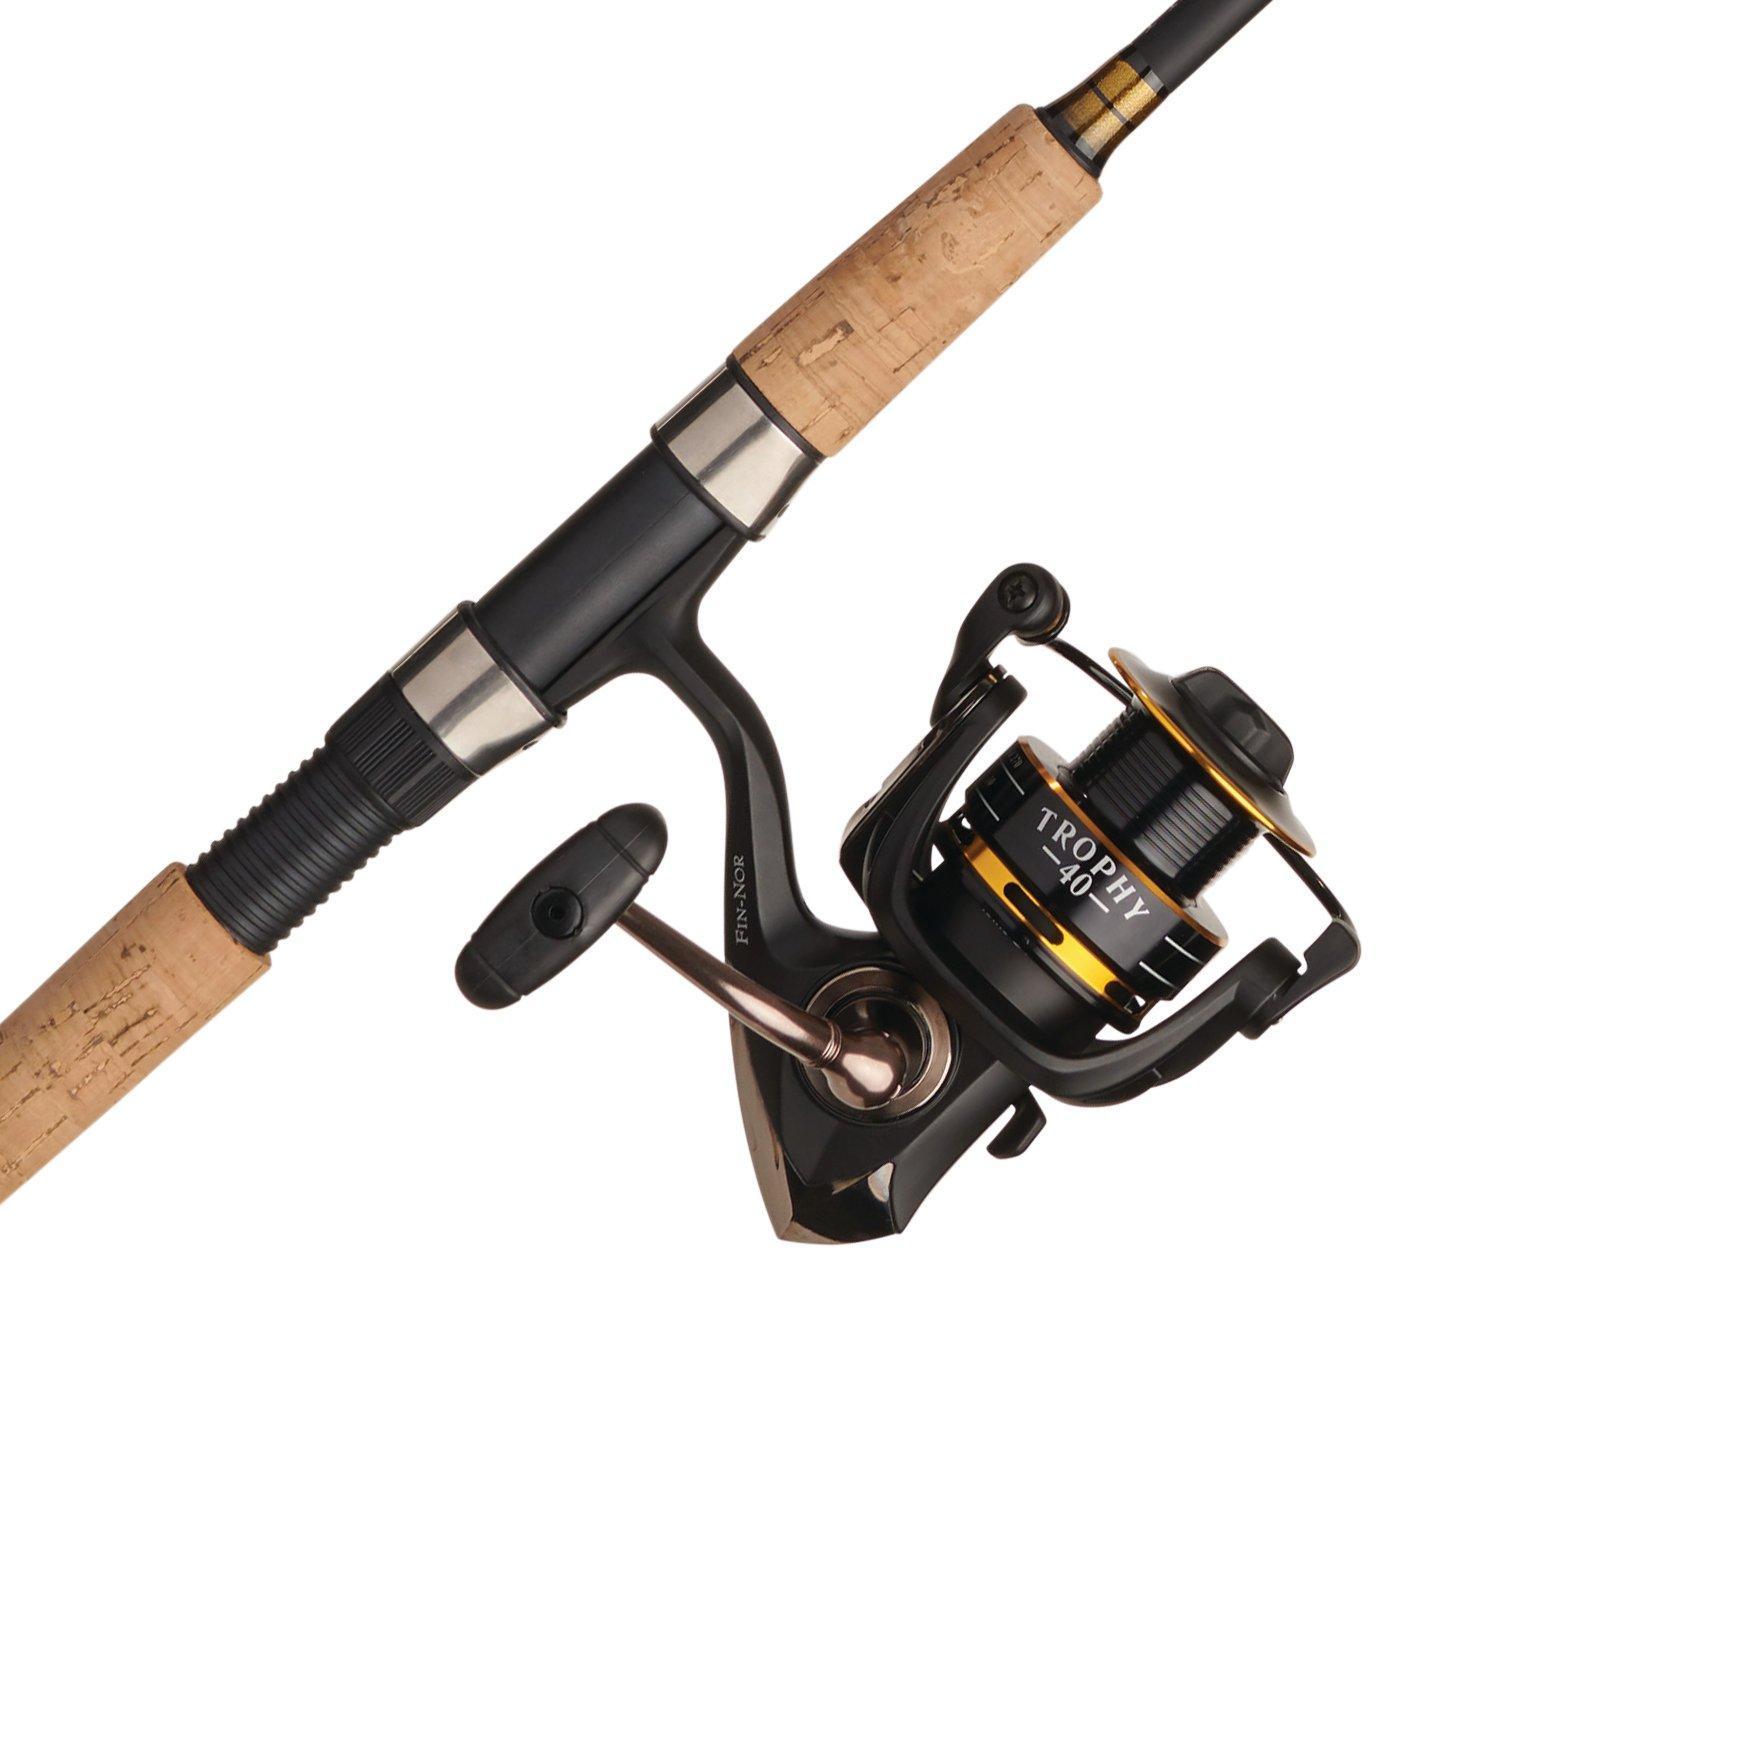 Shakespeare Lady Fish Spinning Reel and Fishing Rod Kit Medium 2 Piece NEW